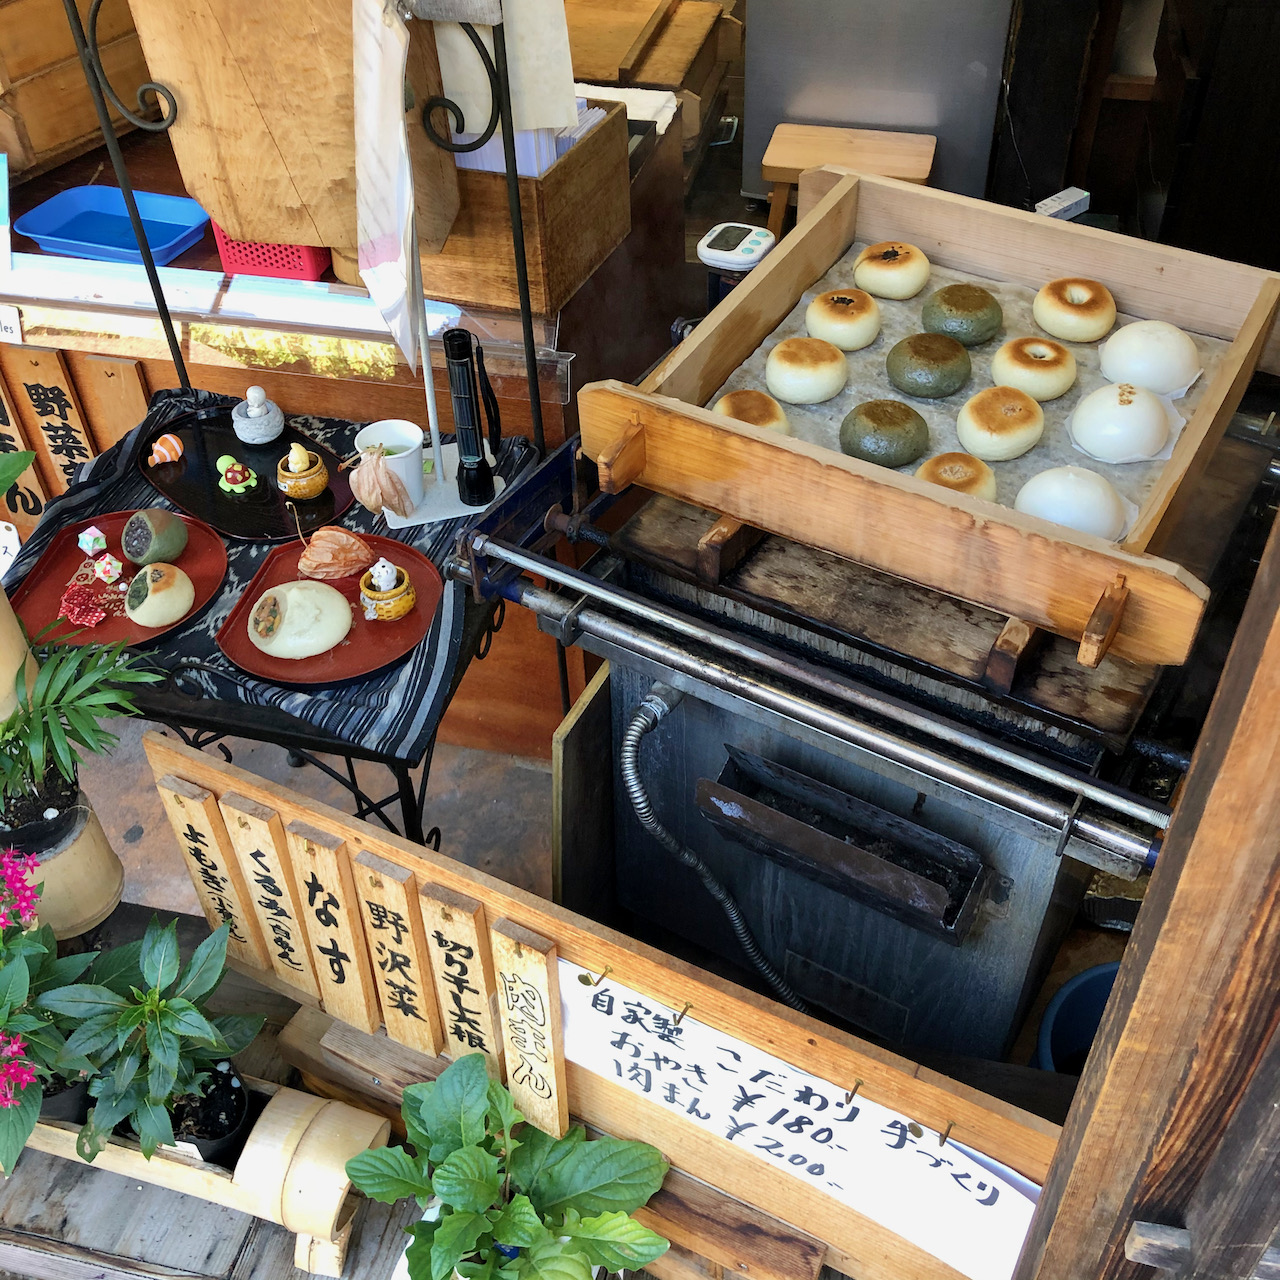 Dumplings in Tsumago, Nagiso-Machi, Kiso-Gun, Nagano, Japan (08.09.2019)